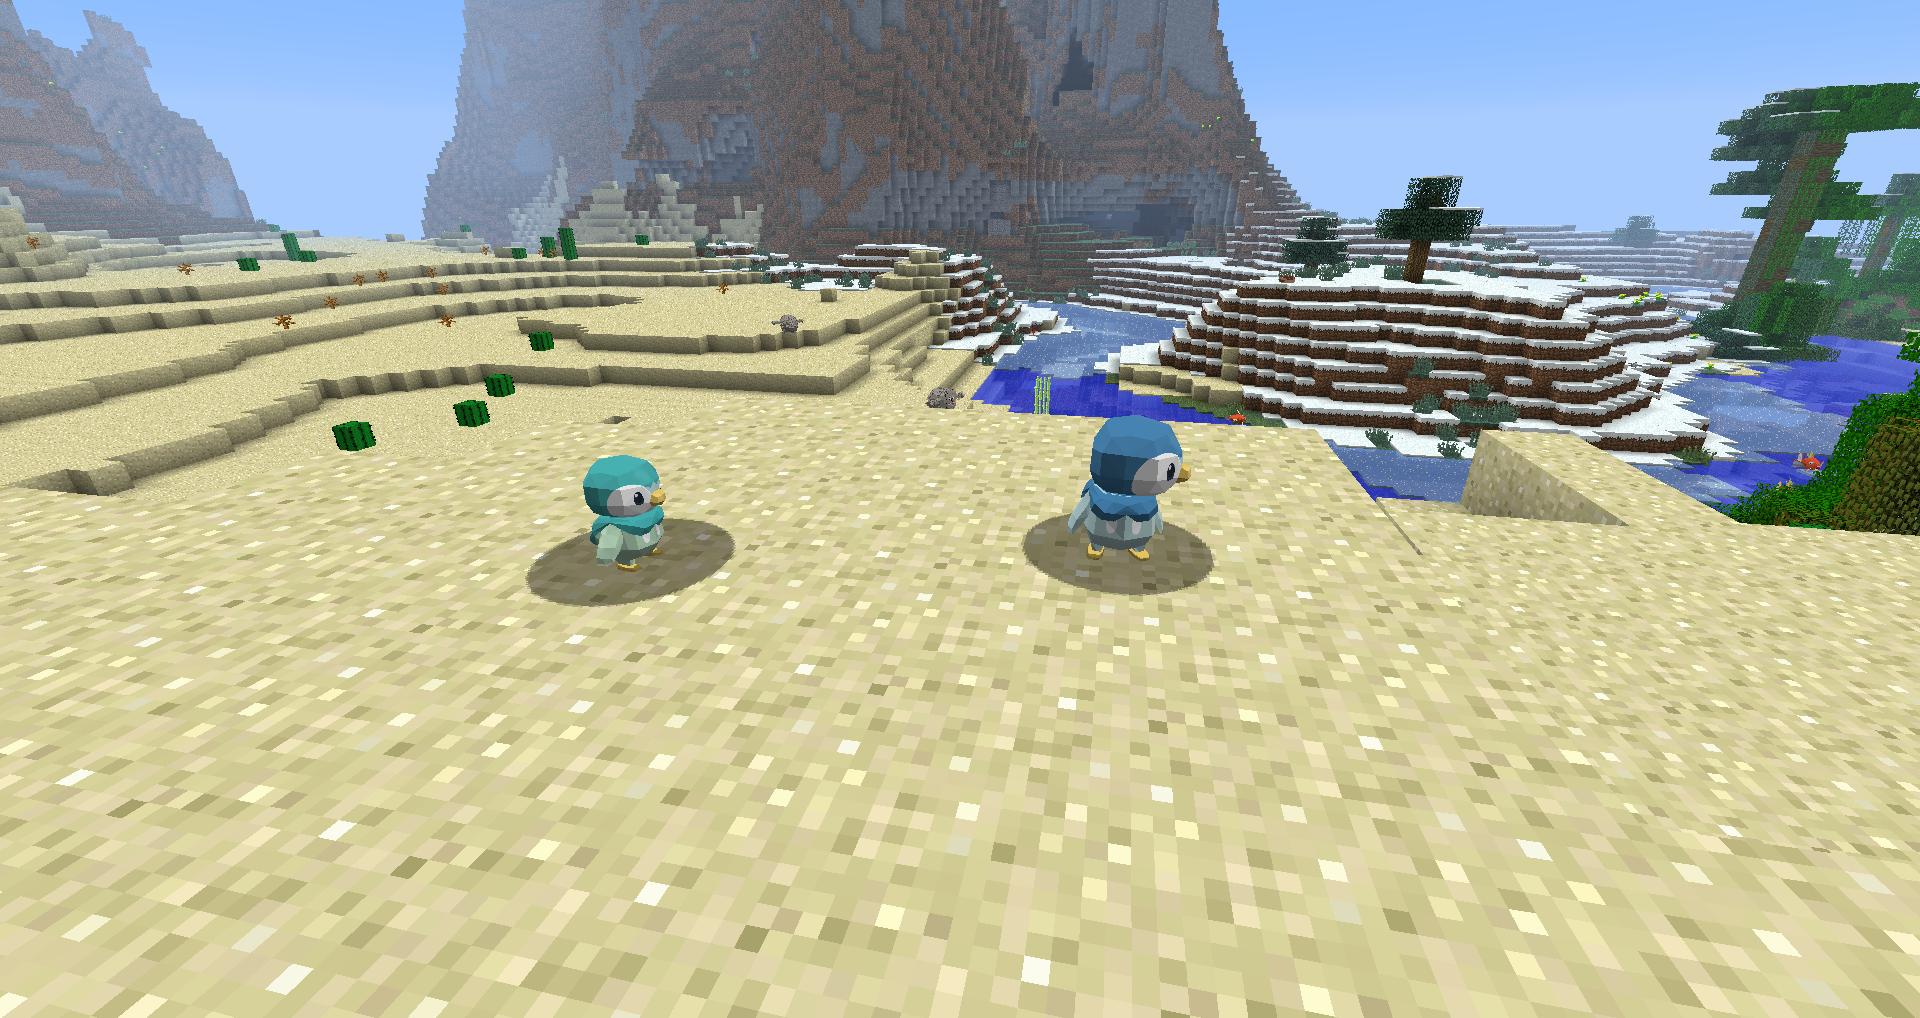 Piplup | Pixelmon mod stuff! <3 | Minecraft mods, Cool minecraft